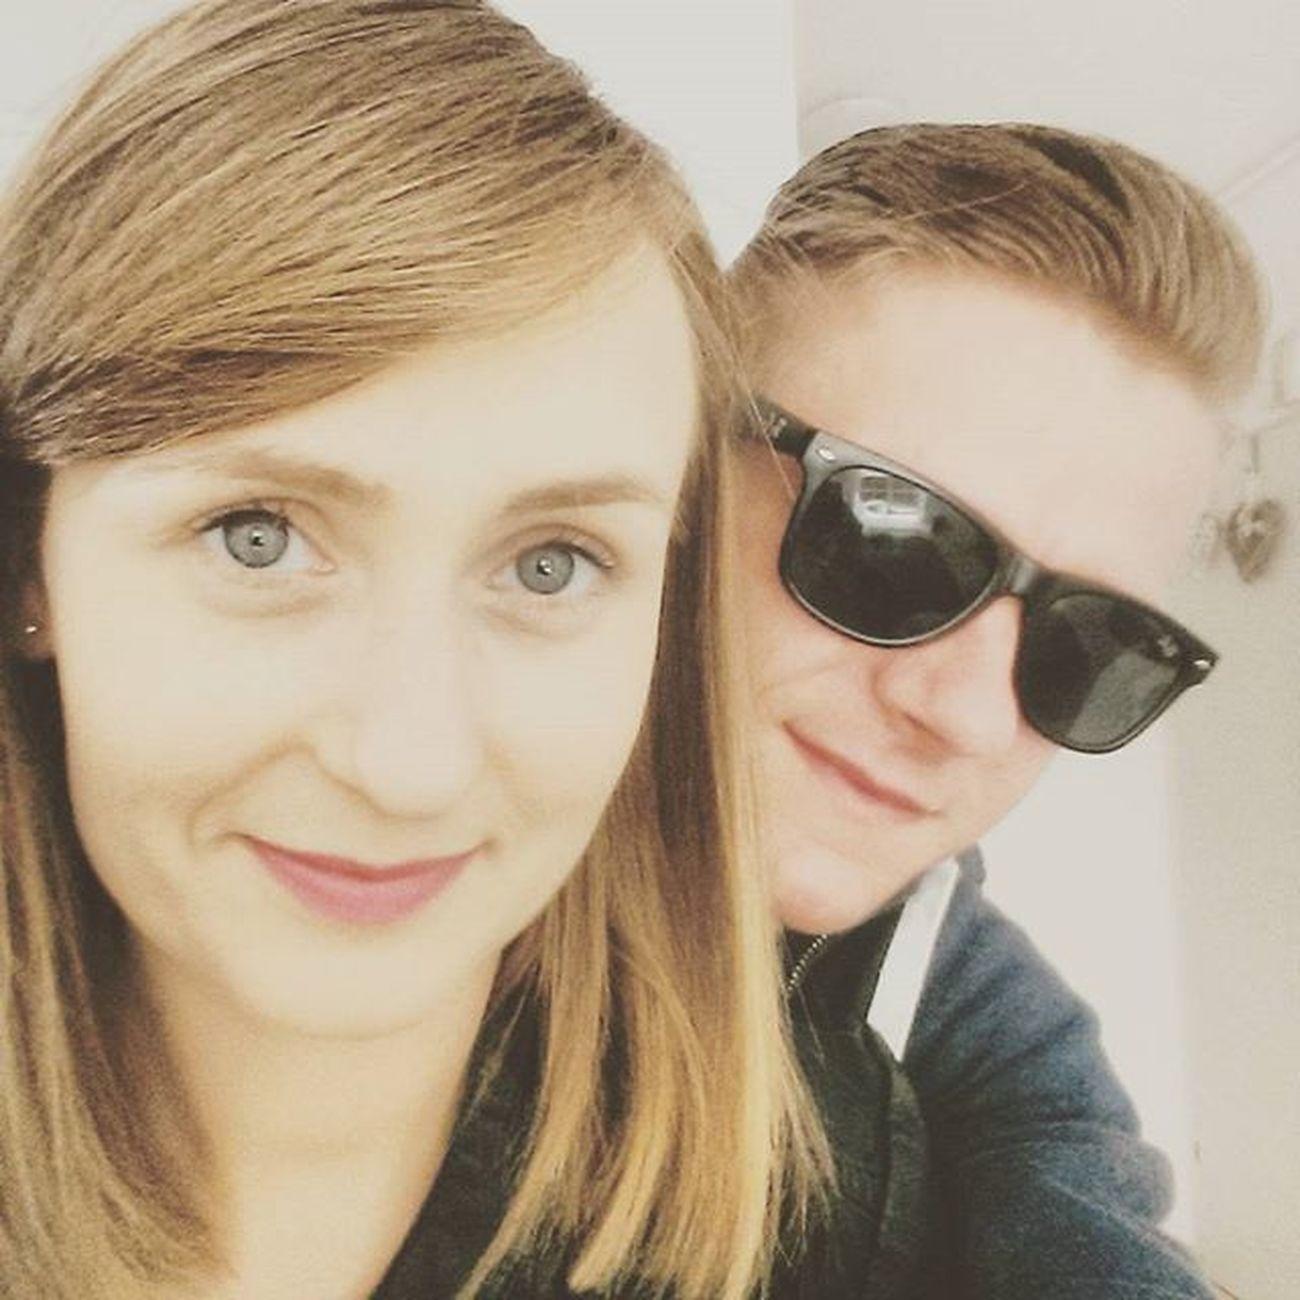 Polishgirl Polishboy  Summertime Urlop Selfie Zakochance Inlove